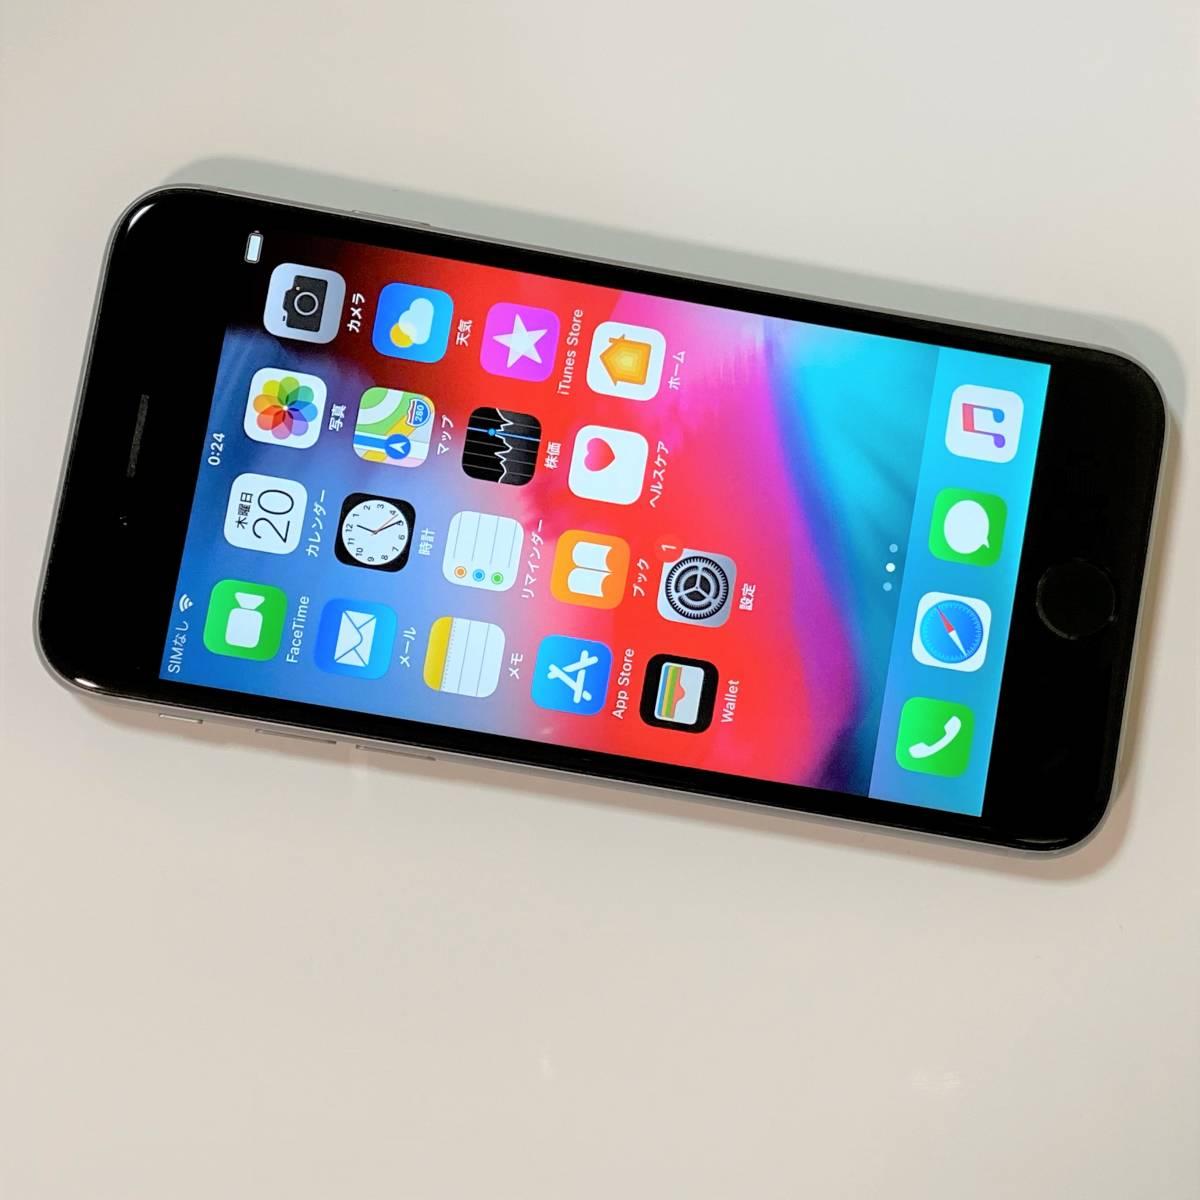 SIMフリー iPhone 6S スペースグレイ 64GB MKQN2J/A iOS12.4 docomo 格安SIM MVNO 海外利用可能 アクティベーションロック解除済